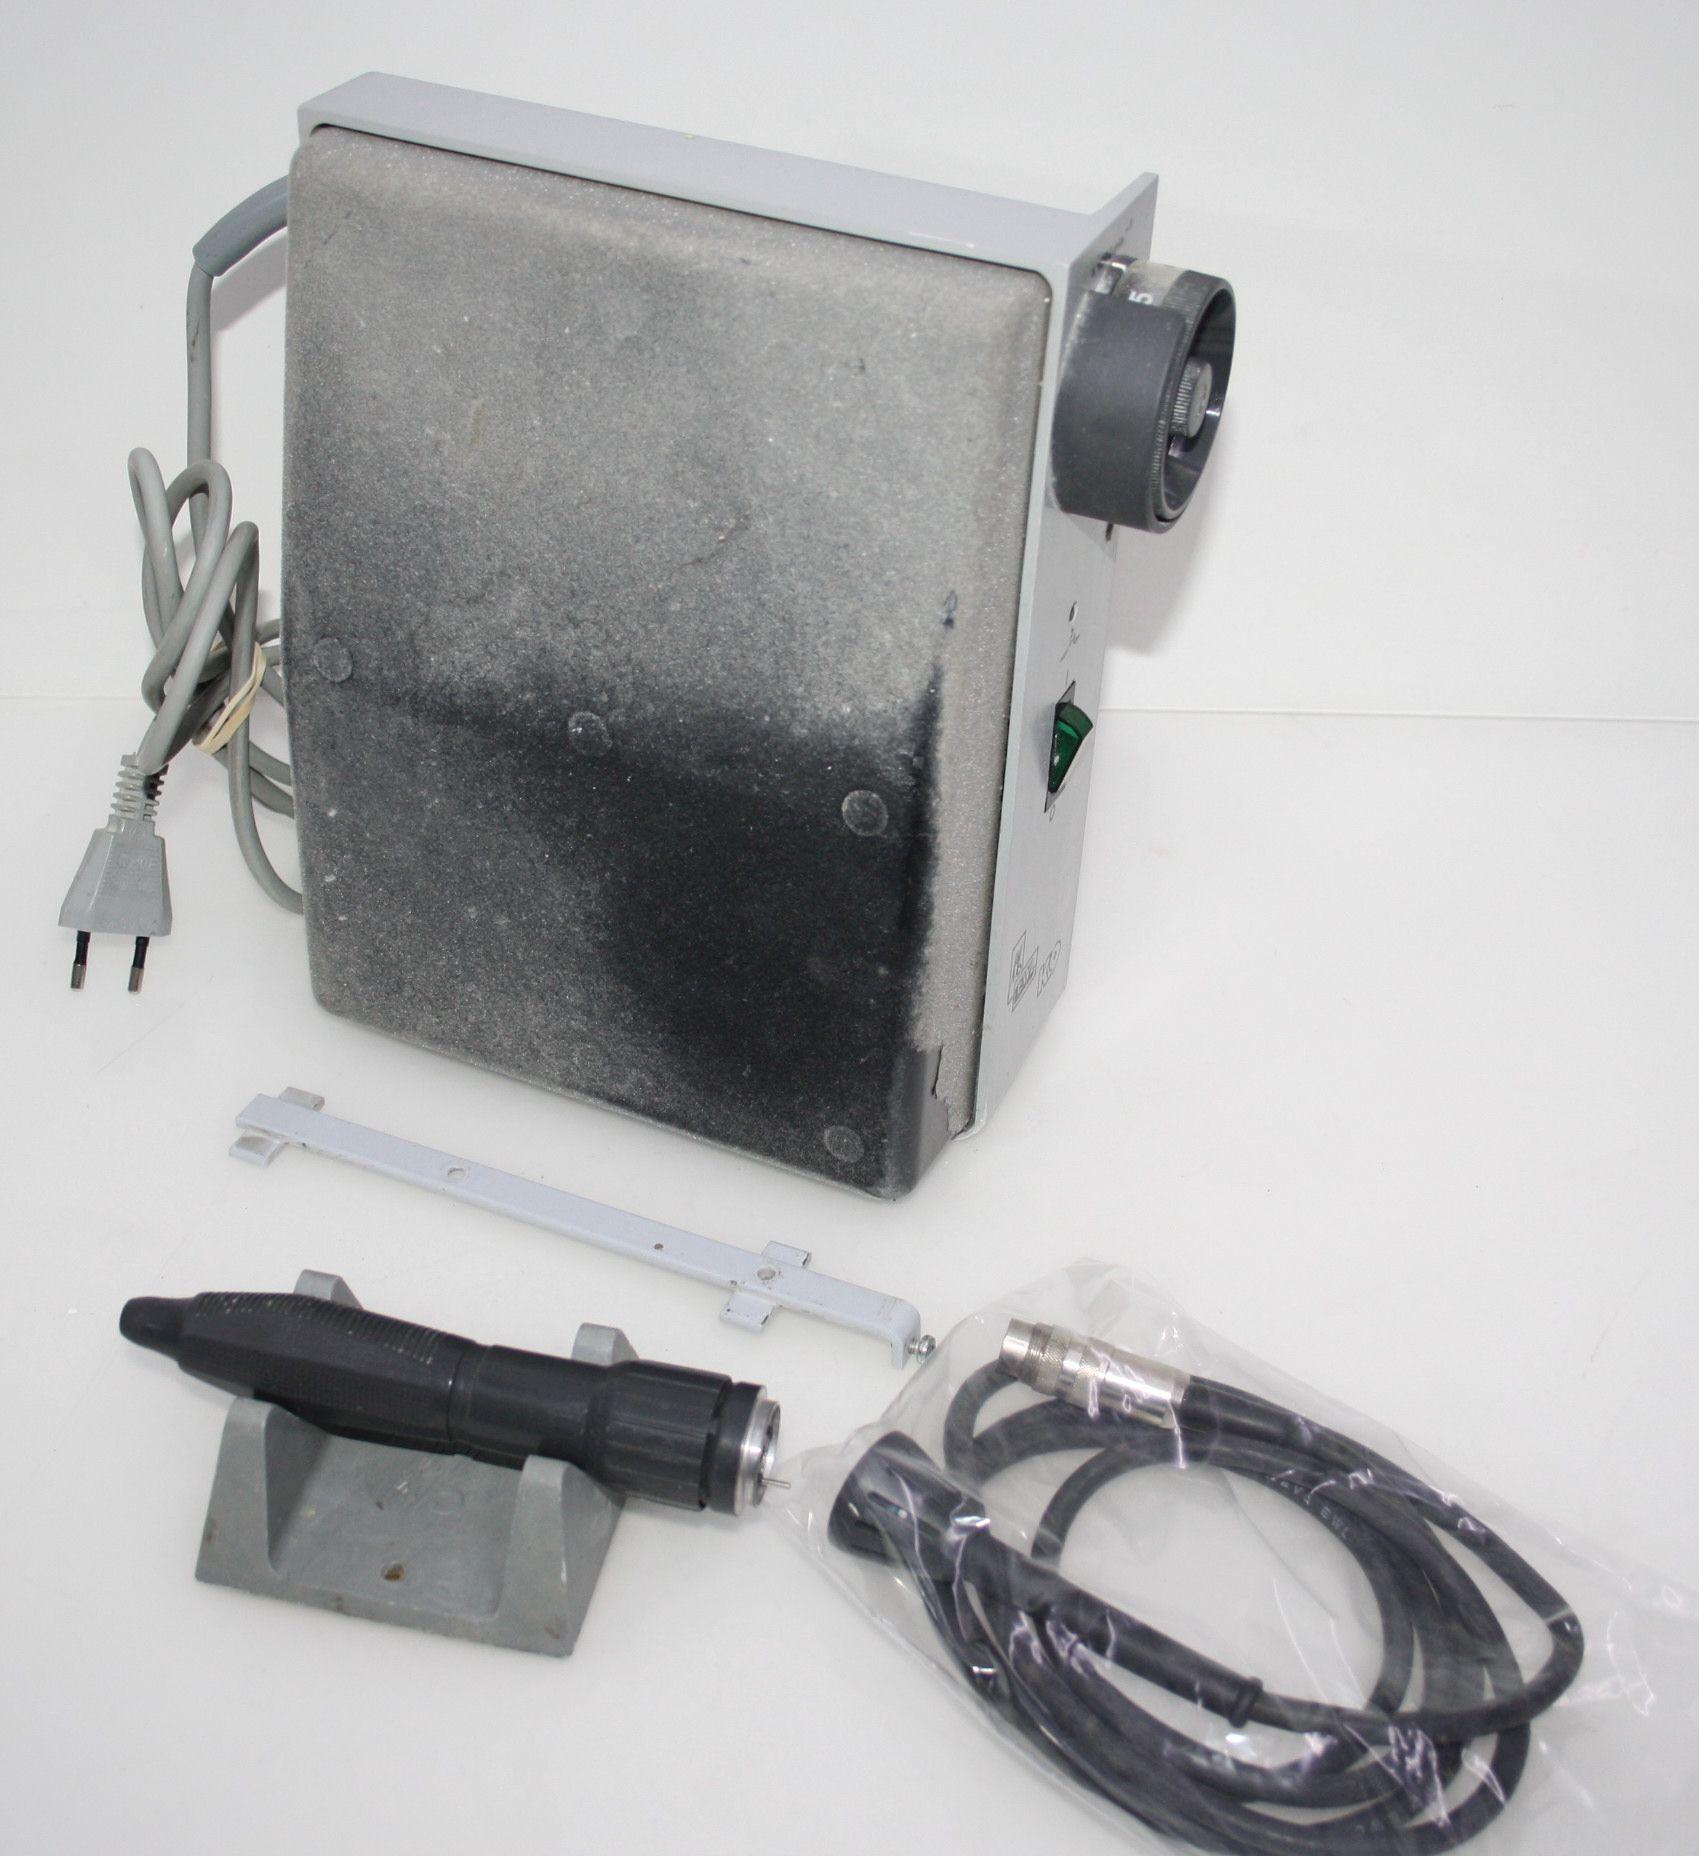 KaVo K 9 Anlage komplett / Technikmaschine # 9530